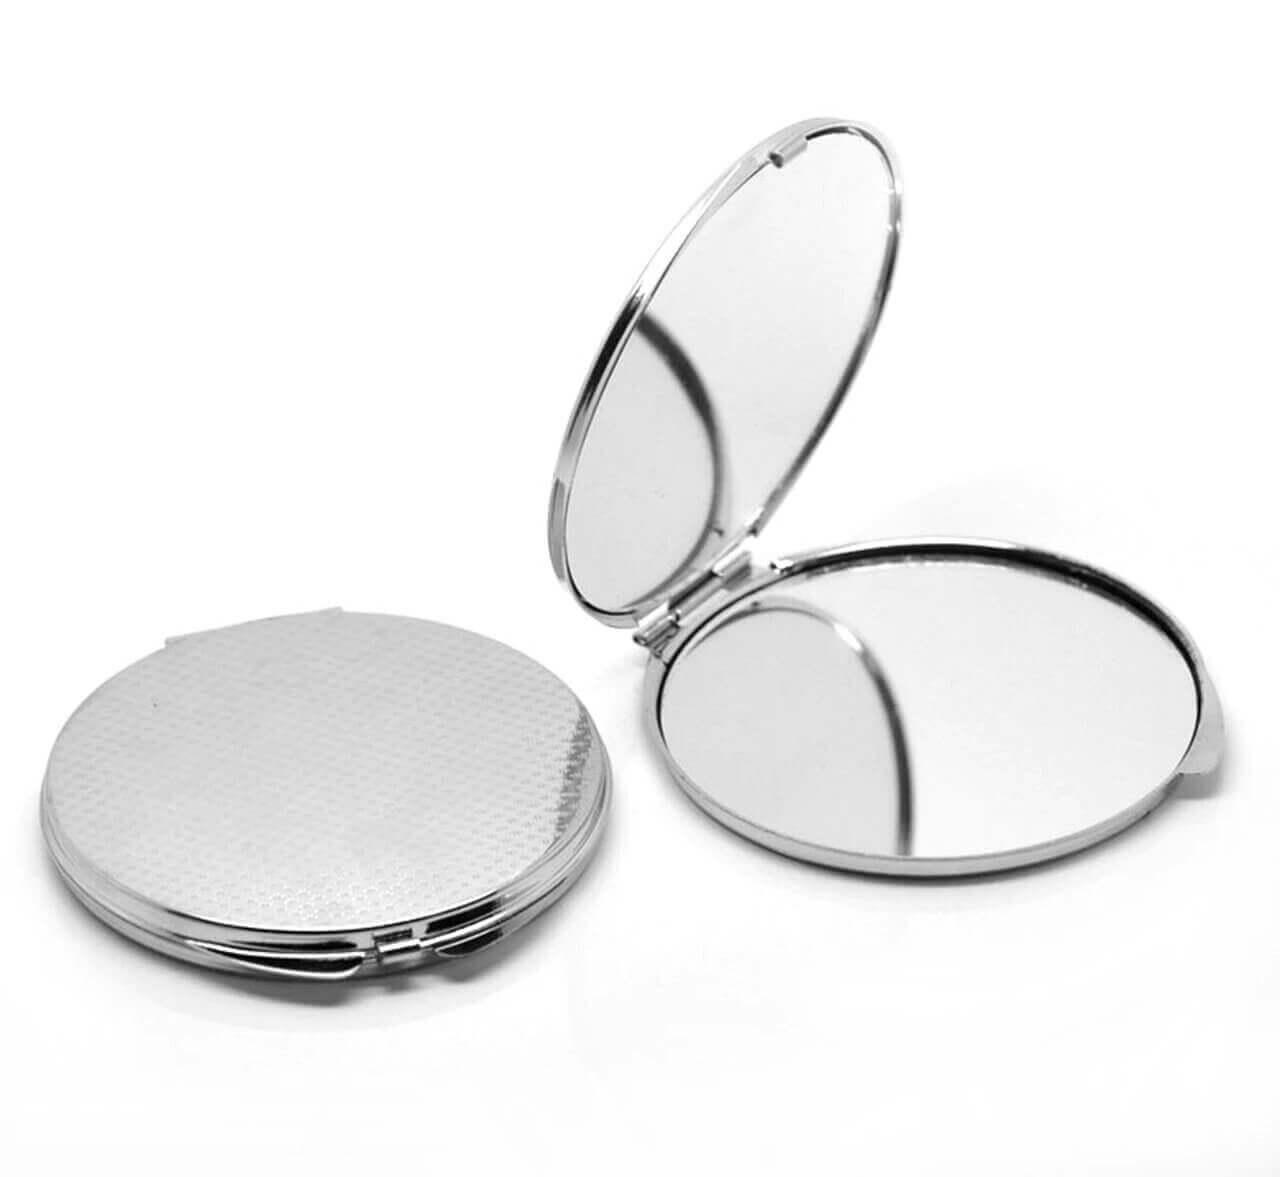 compact mirror for purse in pakistan sanwarna.pk